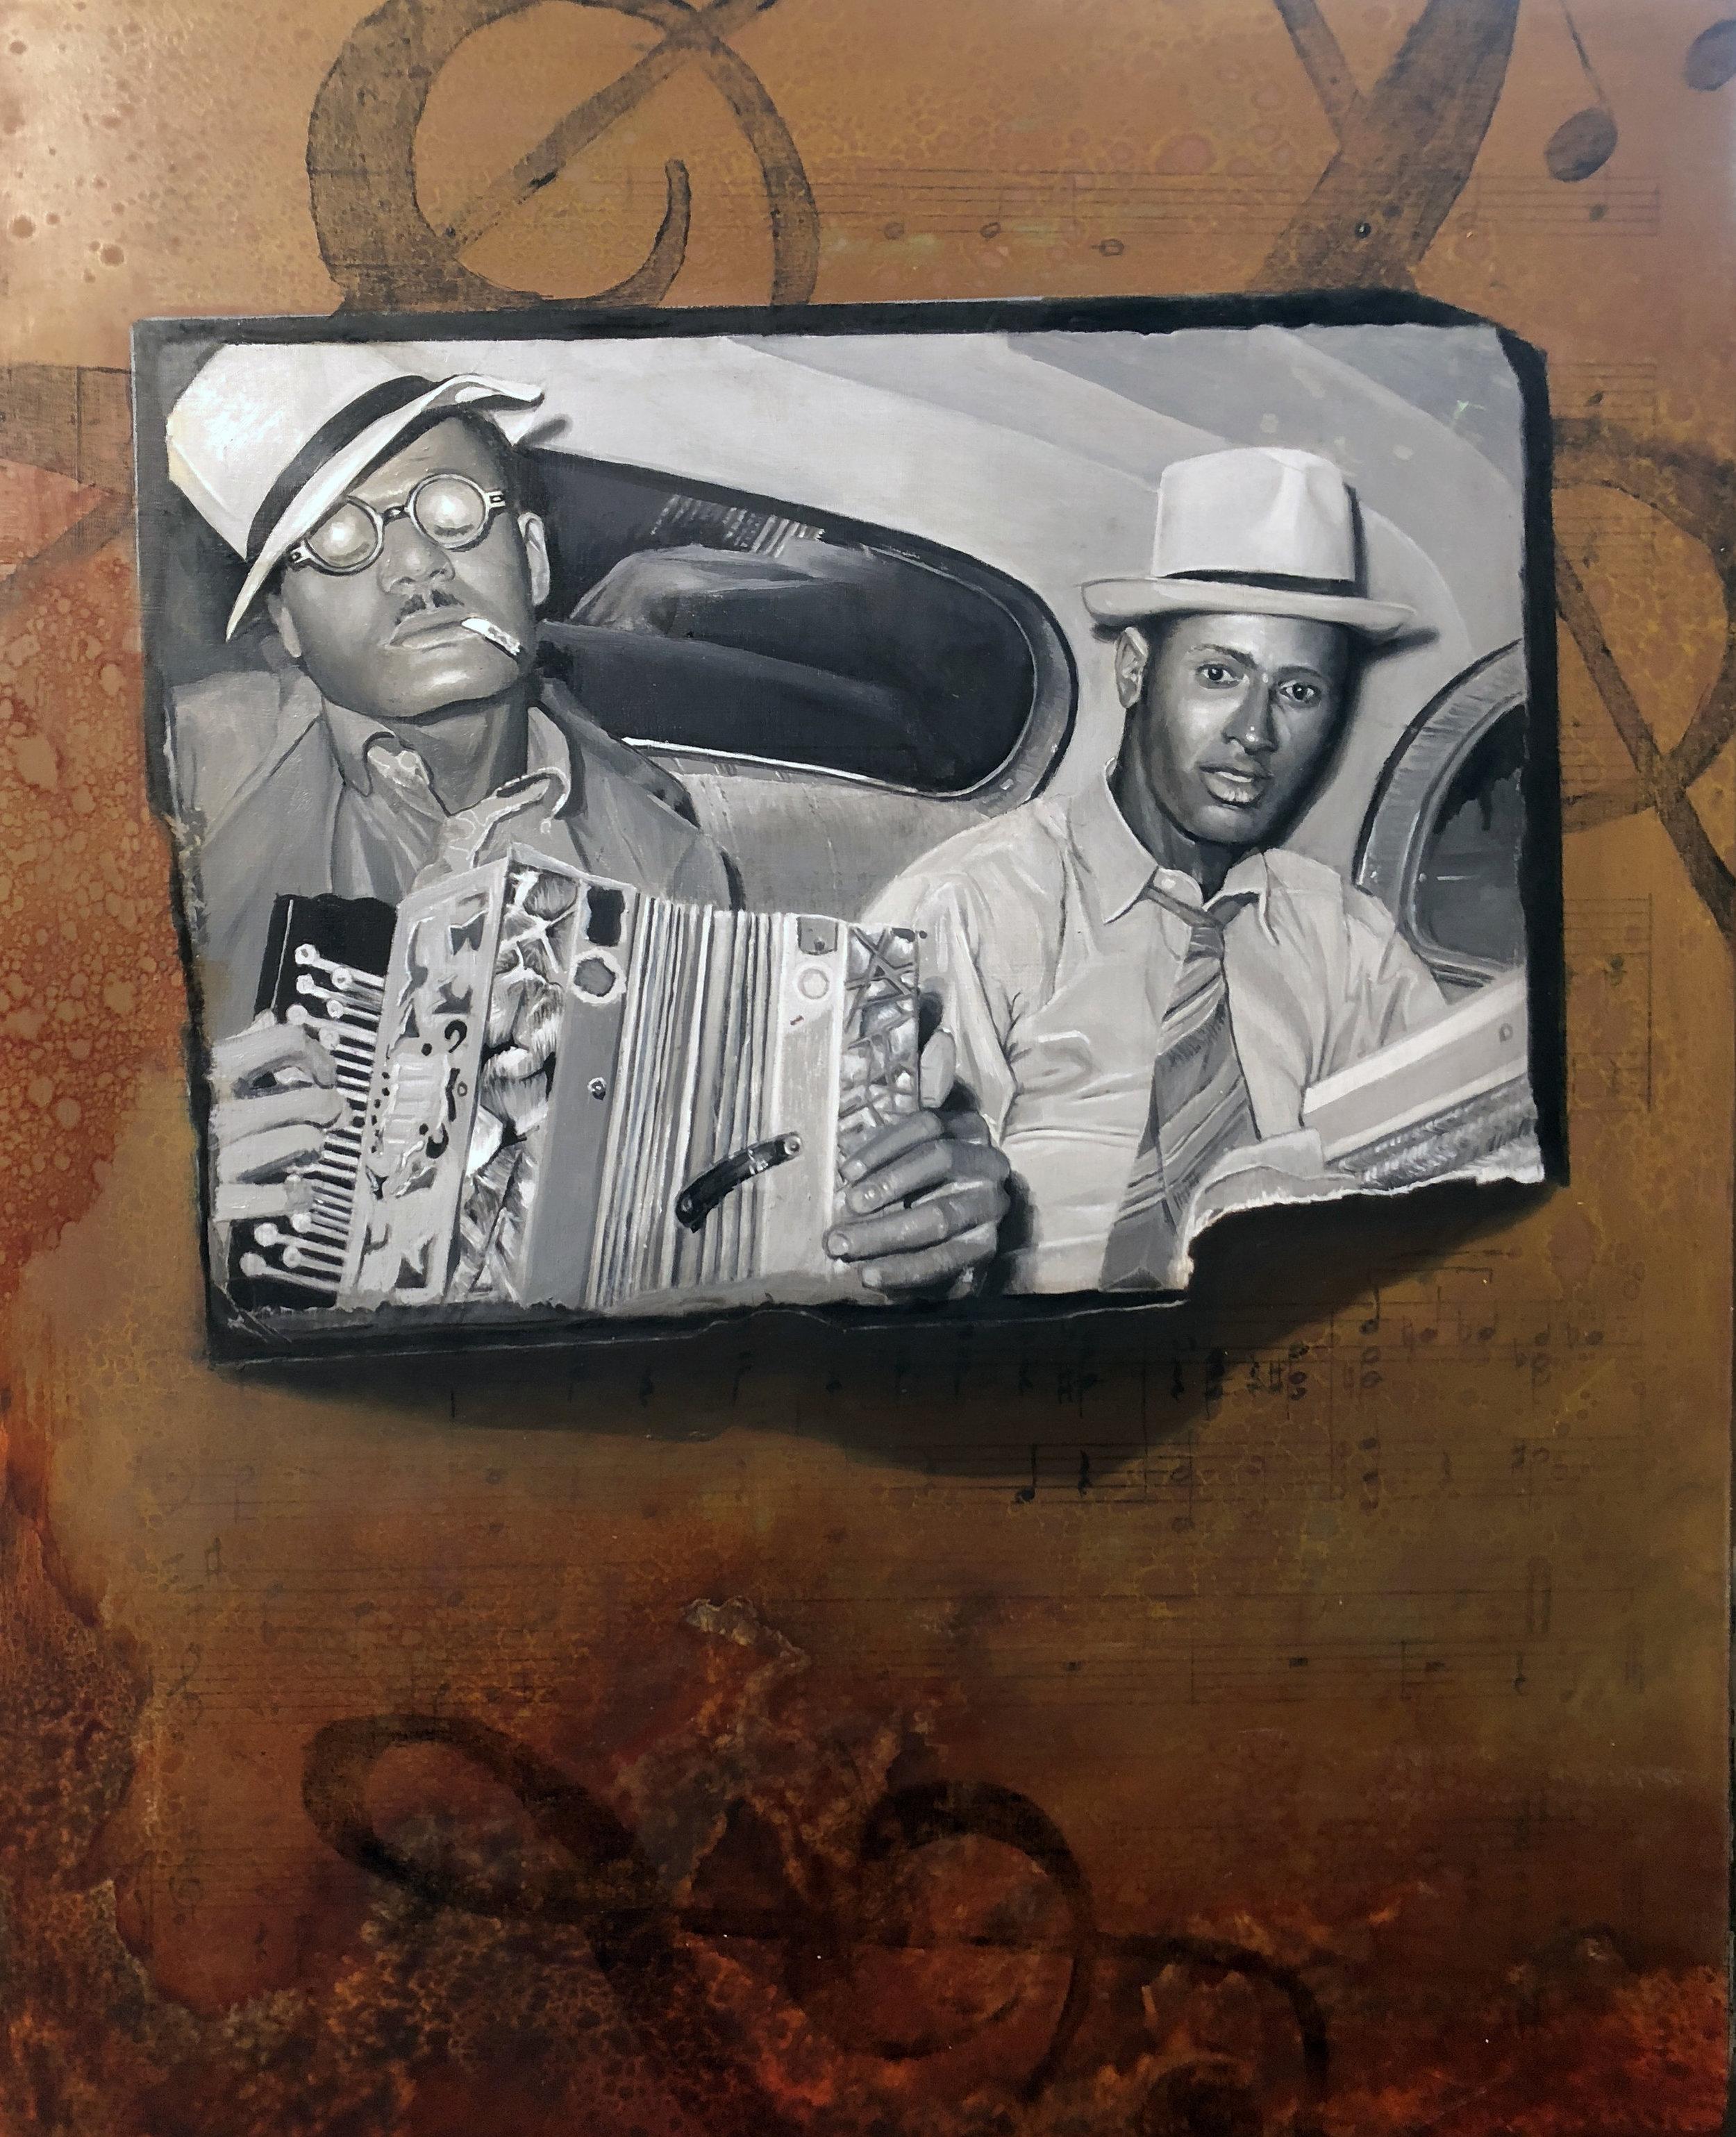 Dennis-Crayon-2-dudes-oil-on-panel-20-x-16.jpg